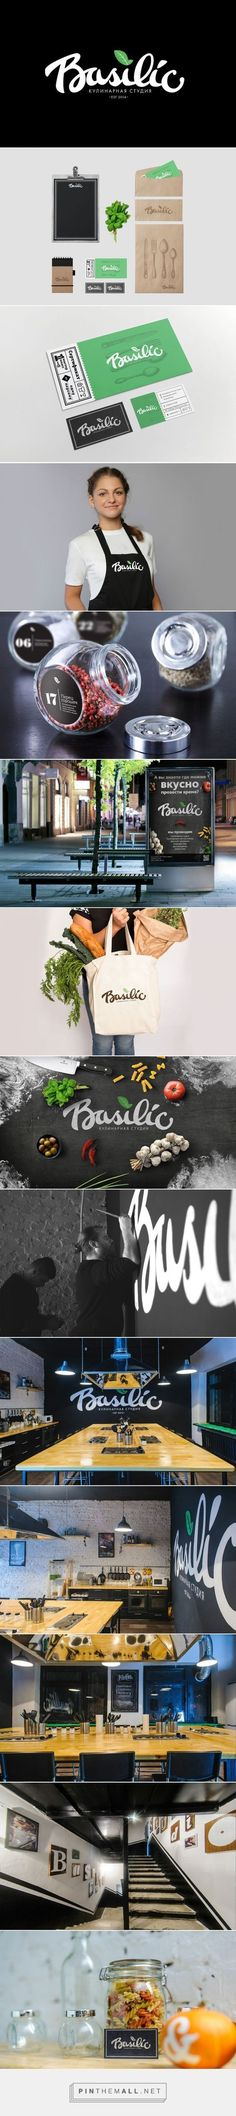 Identity / food / restaurant / Basilic Branding by Stepan Solodkov | Fivestar Branding – Design and Branding Agency & Inspiration Gallery